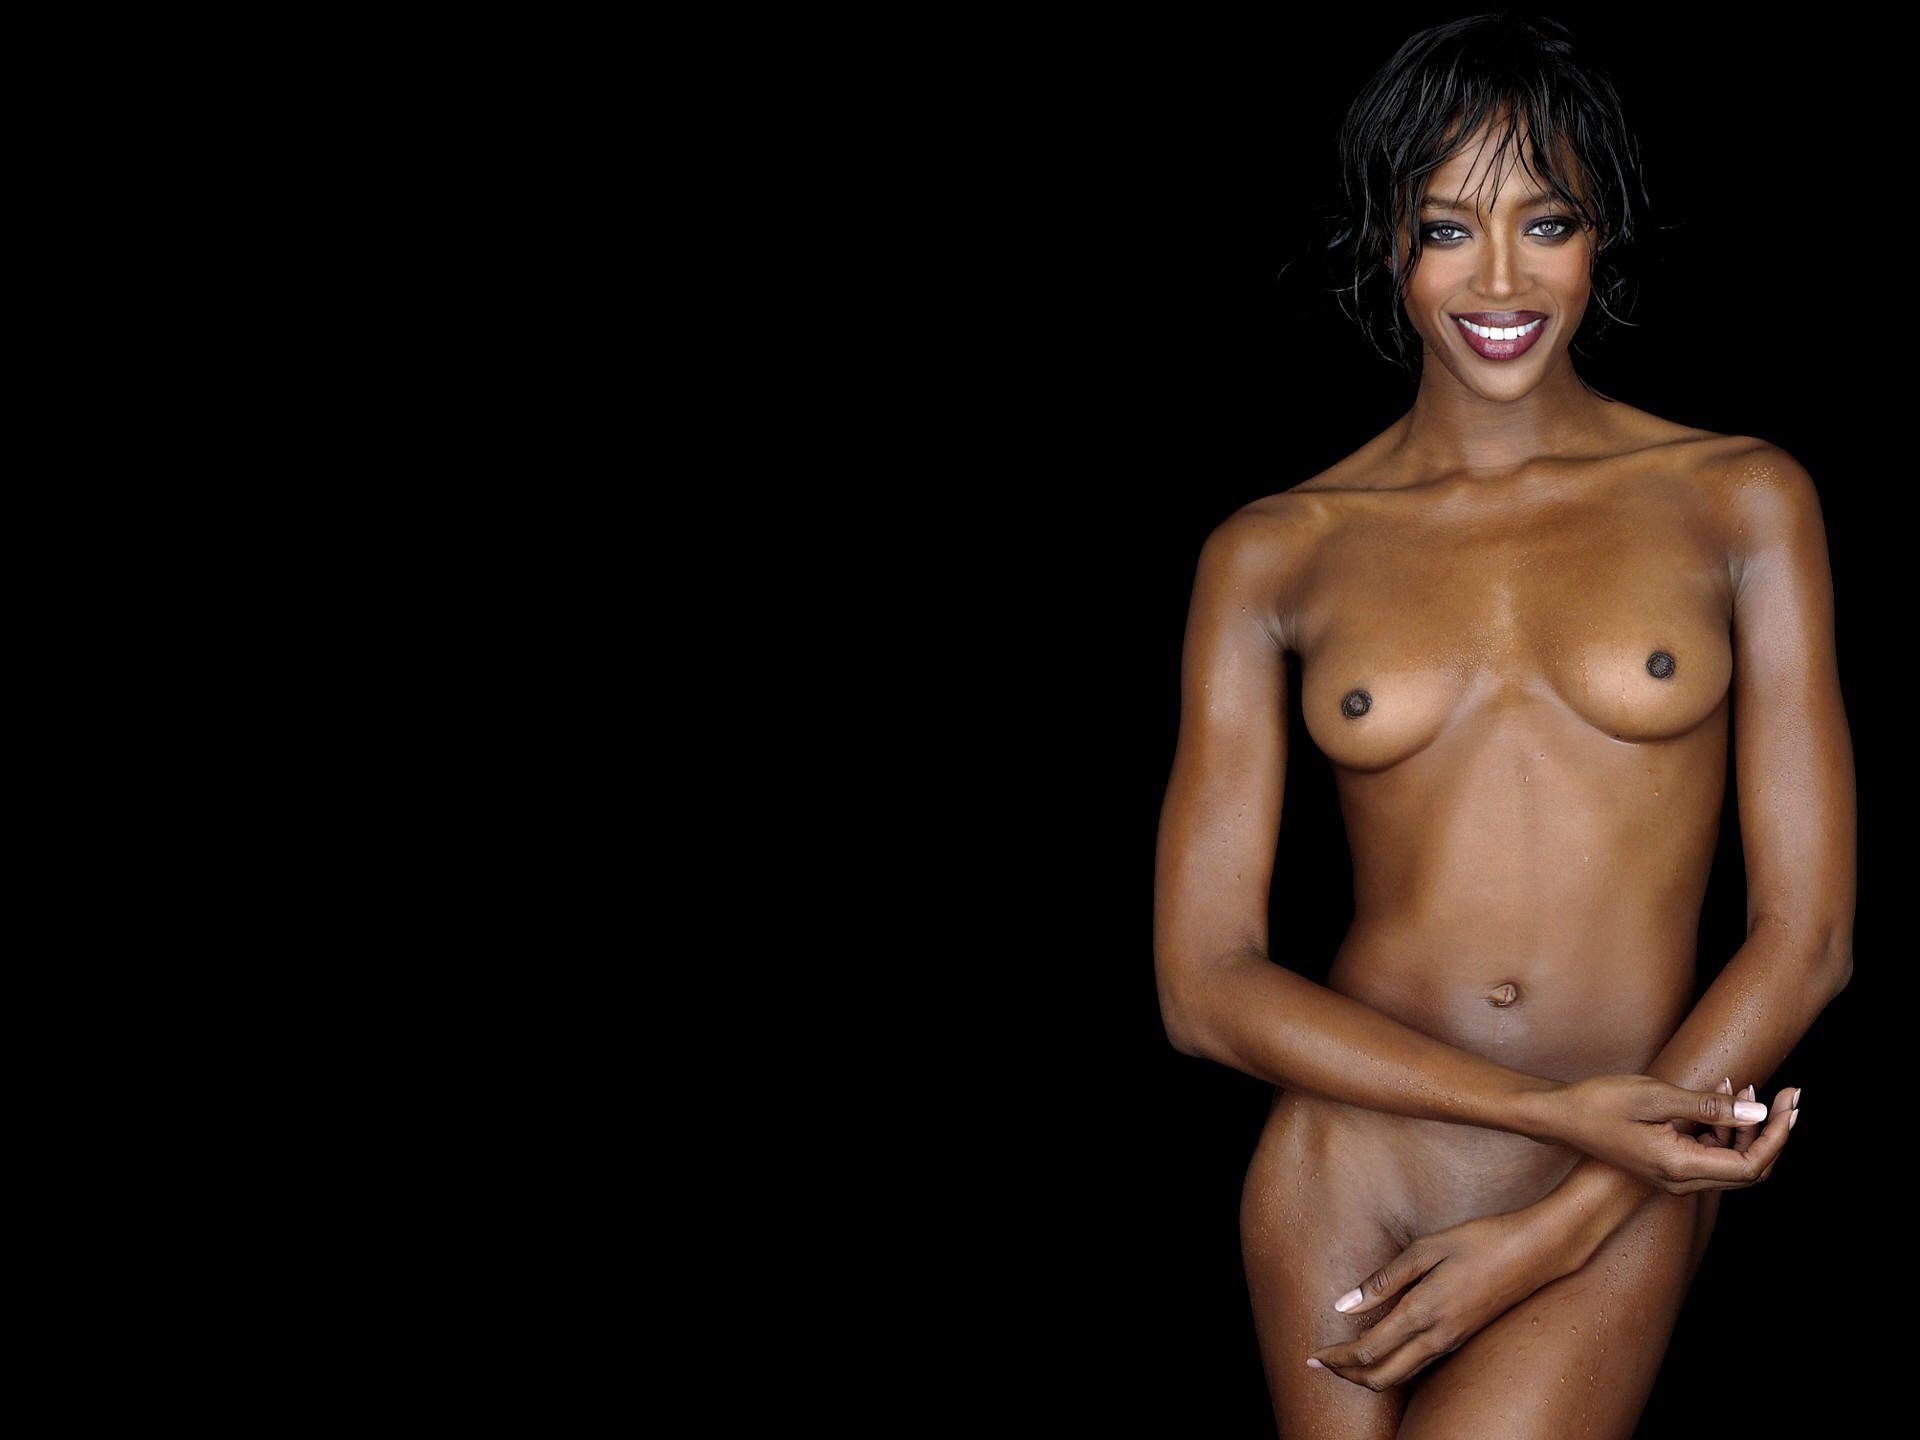 Sexy naomi naked, elise erotic pics free